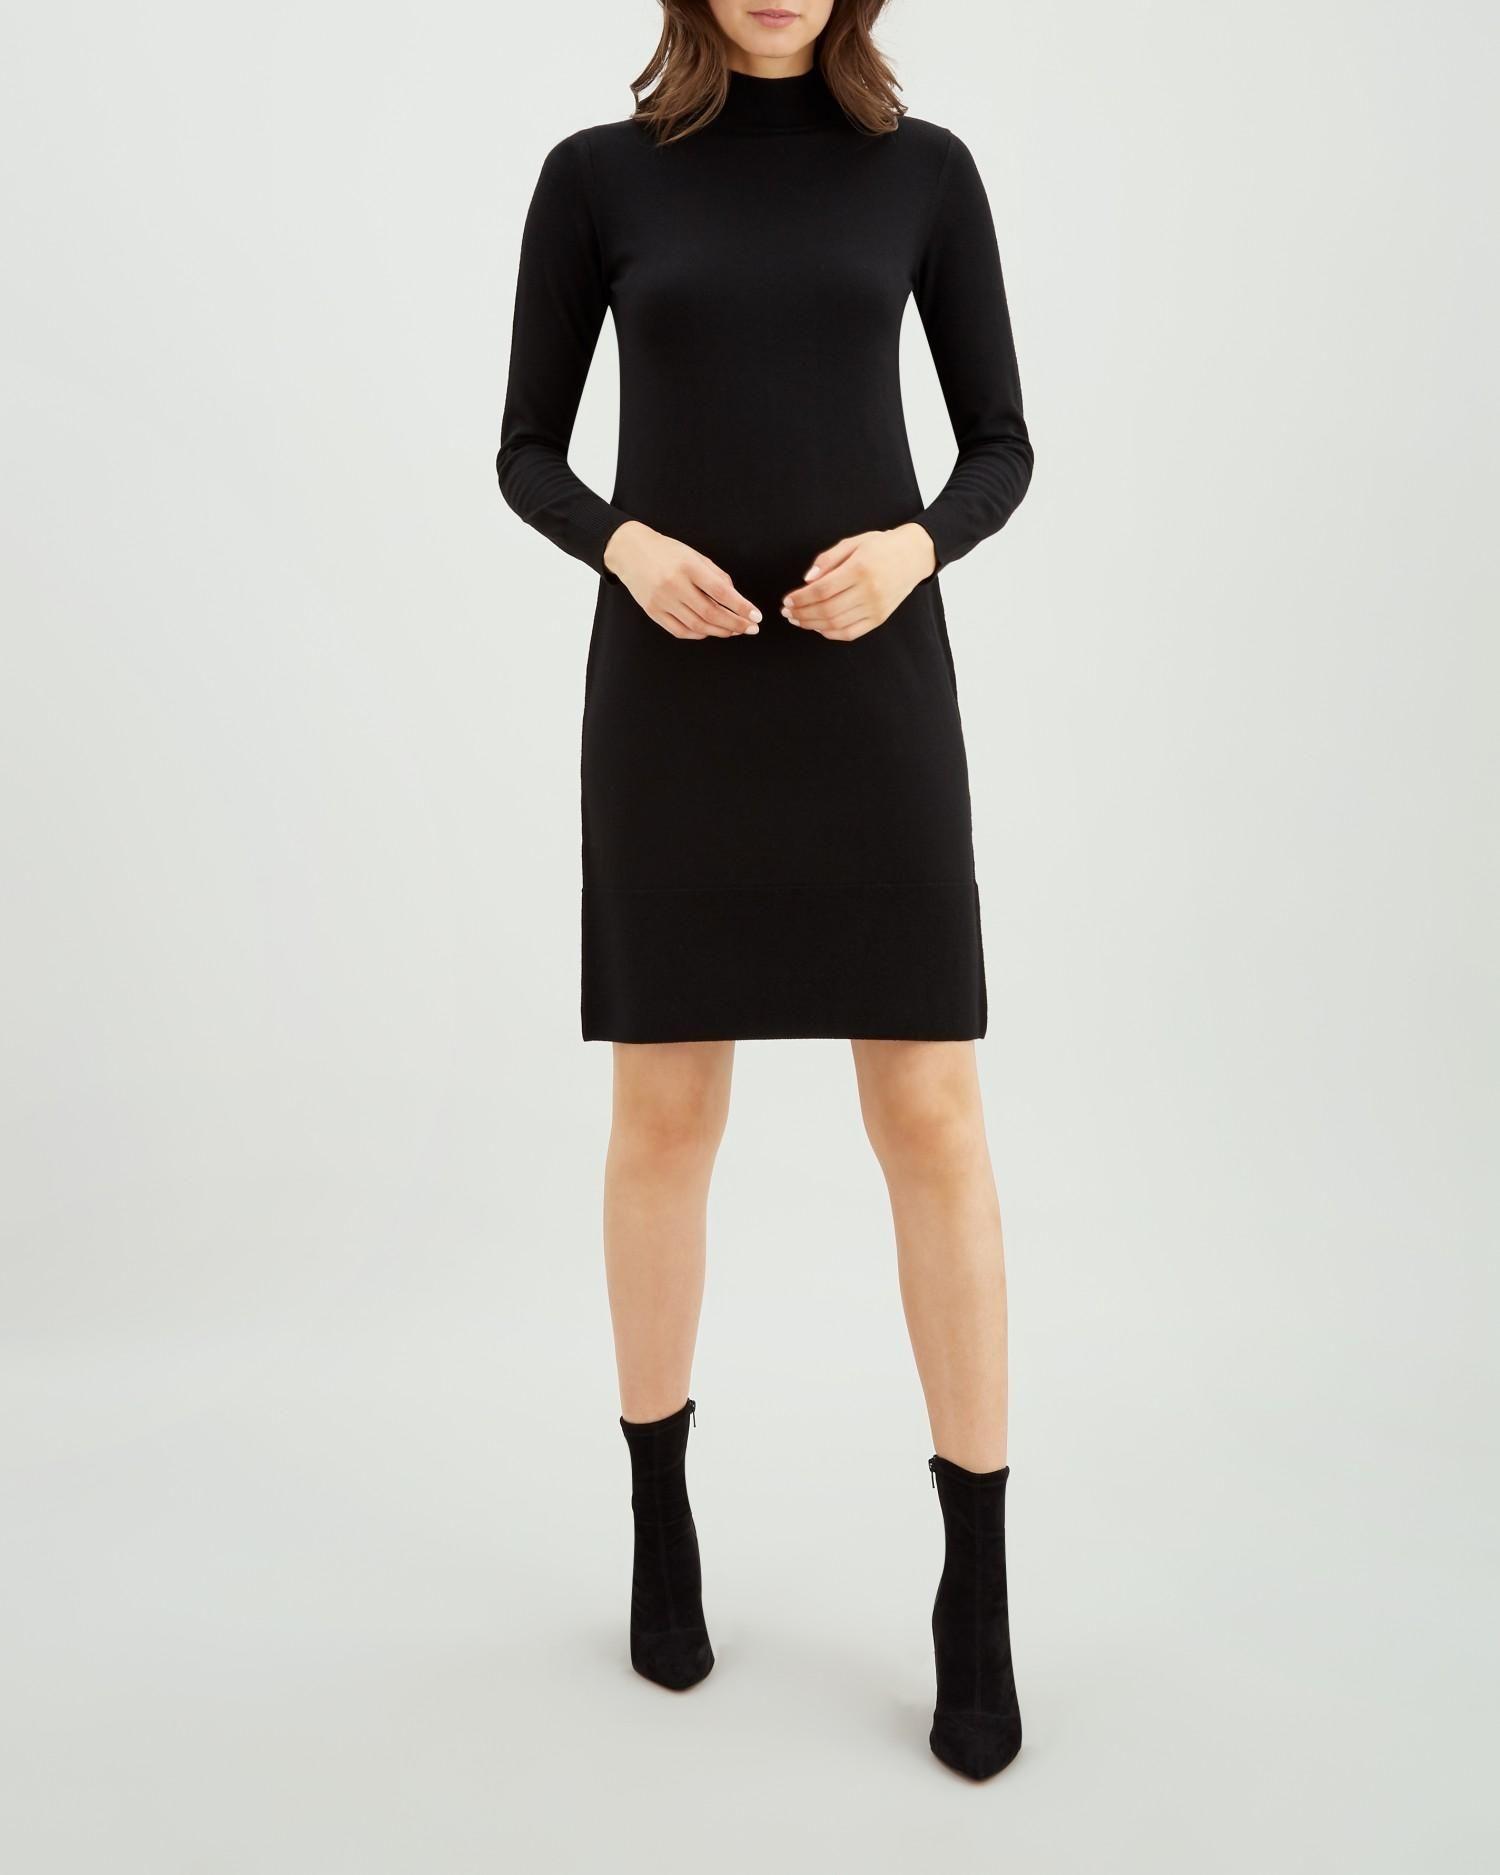 7465ddecbfaf8d Black Contrast Rib Detail Knit Dress | Jaeger | Lust List in 2019 ...